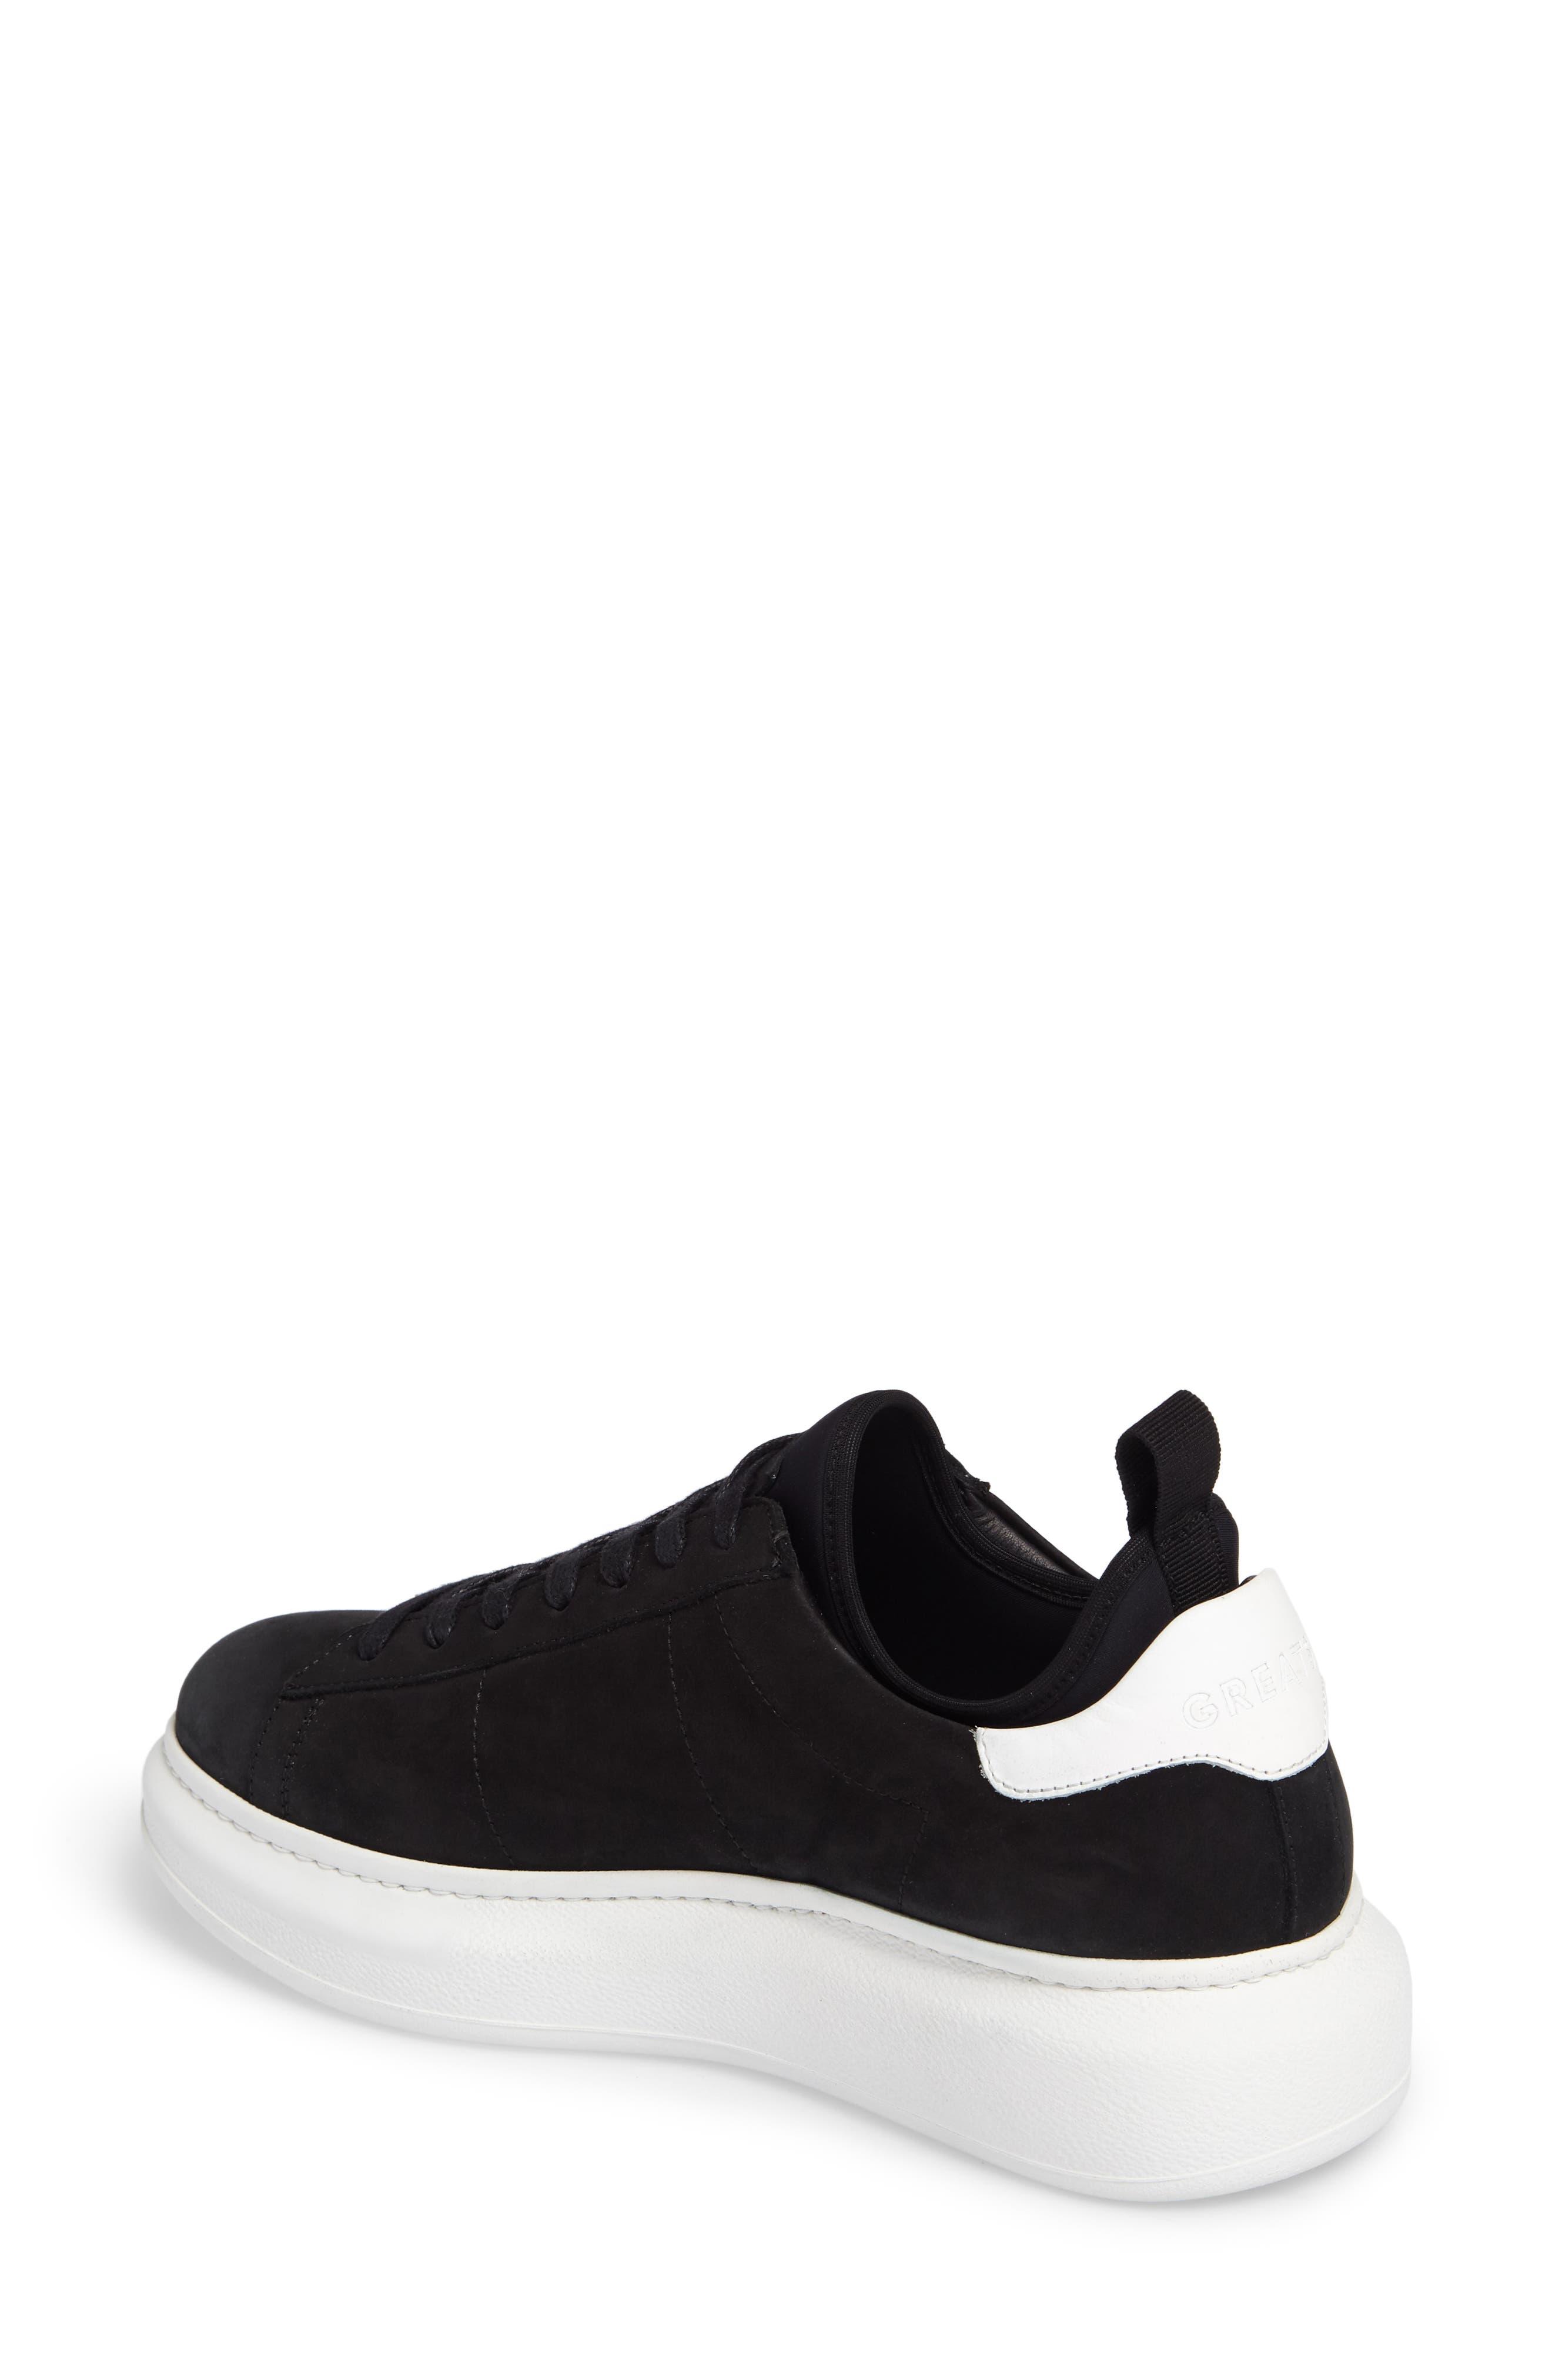 Alta Low Top Sneaker,                             Alternate thumbnail 2, color,                             BLACK NUBUCK LEATHER